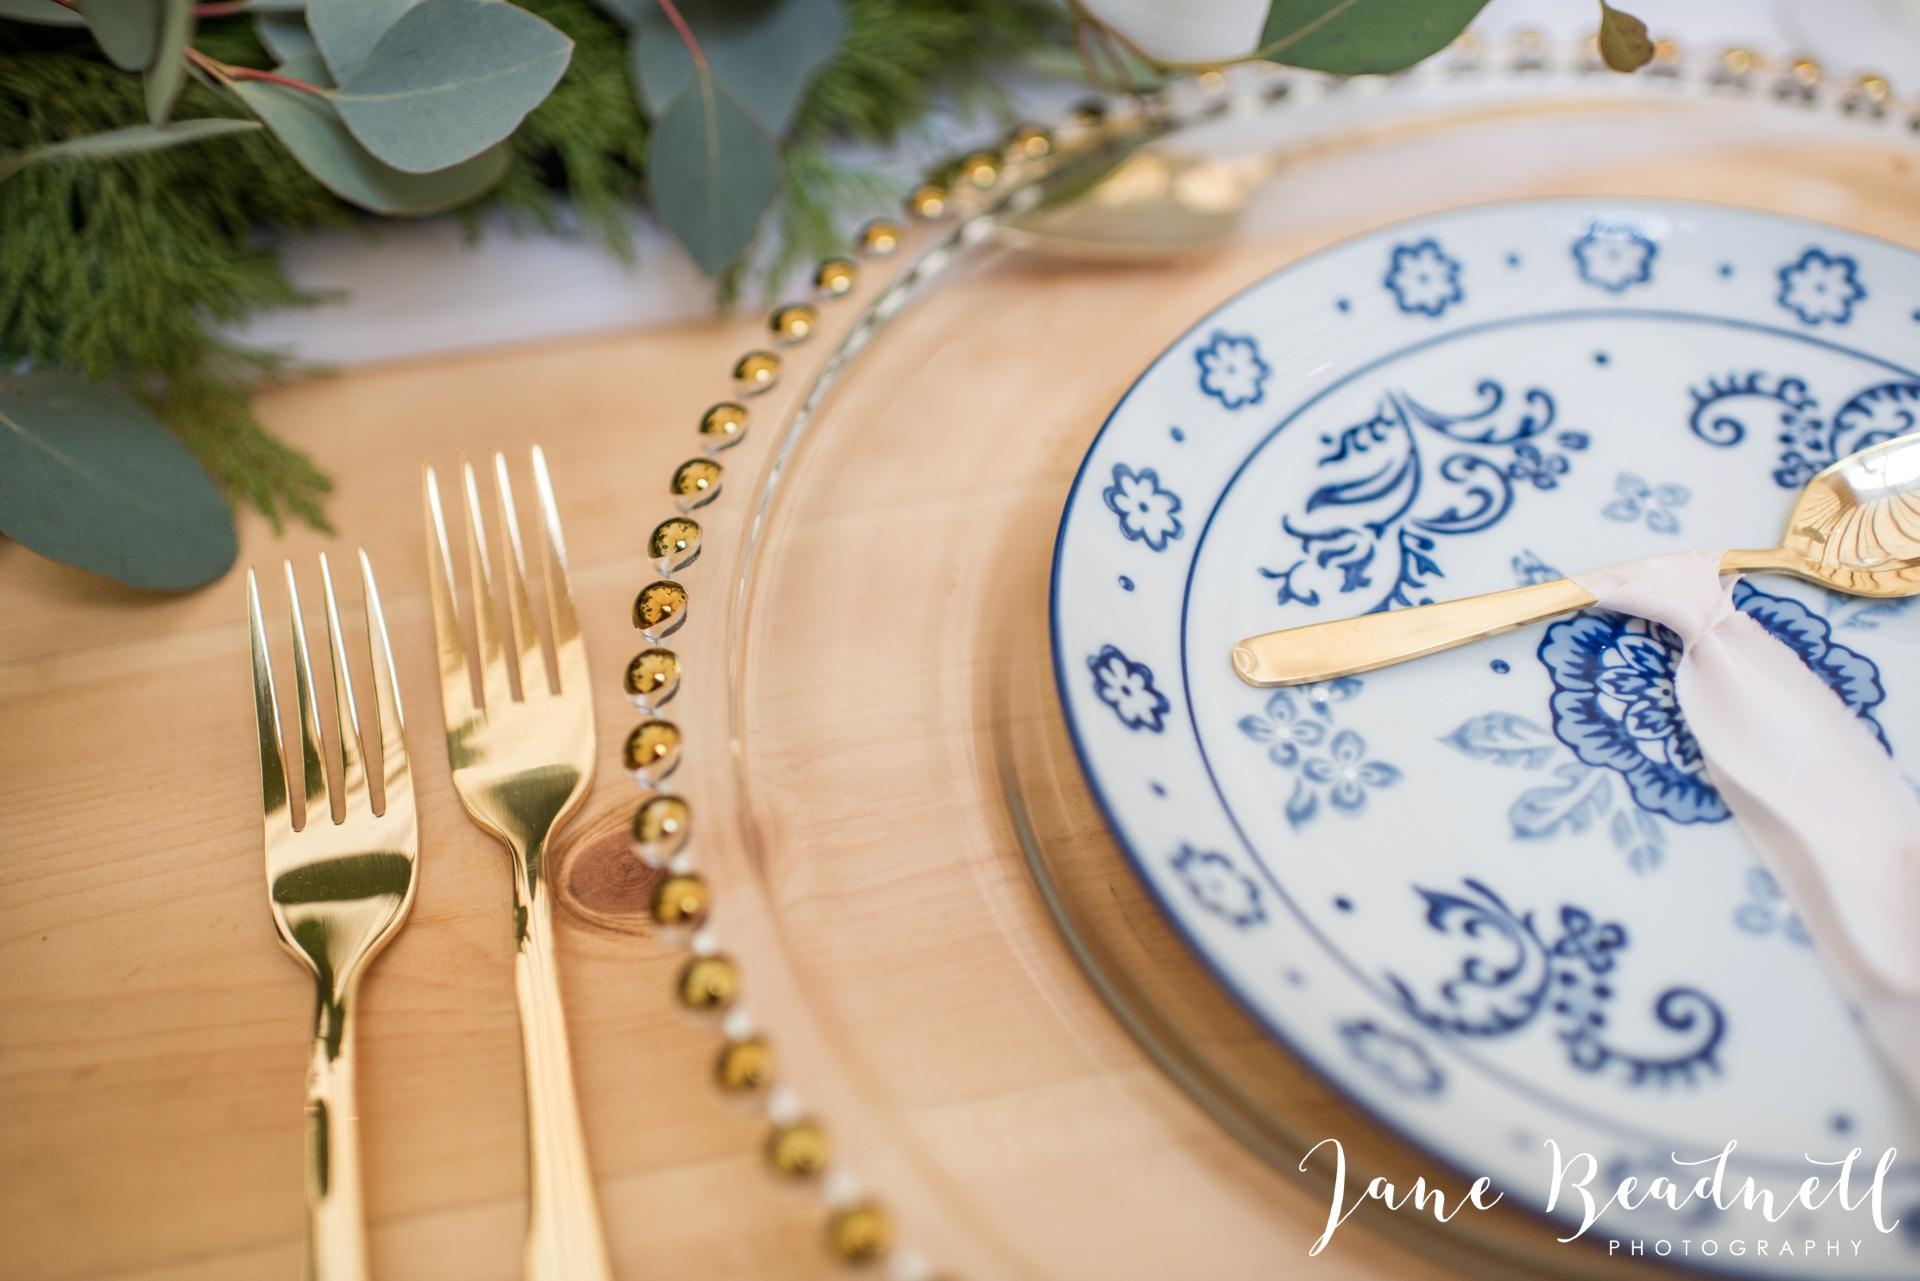 The Bivouac Masham fine art wedding photography jane beadnell photography_0004